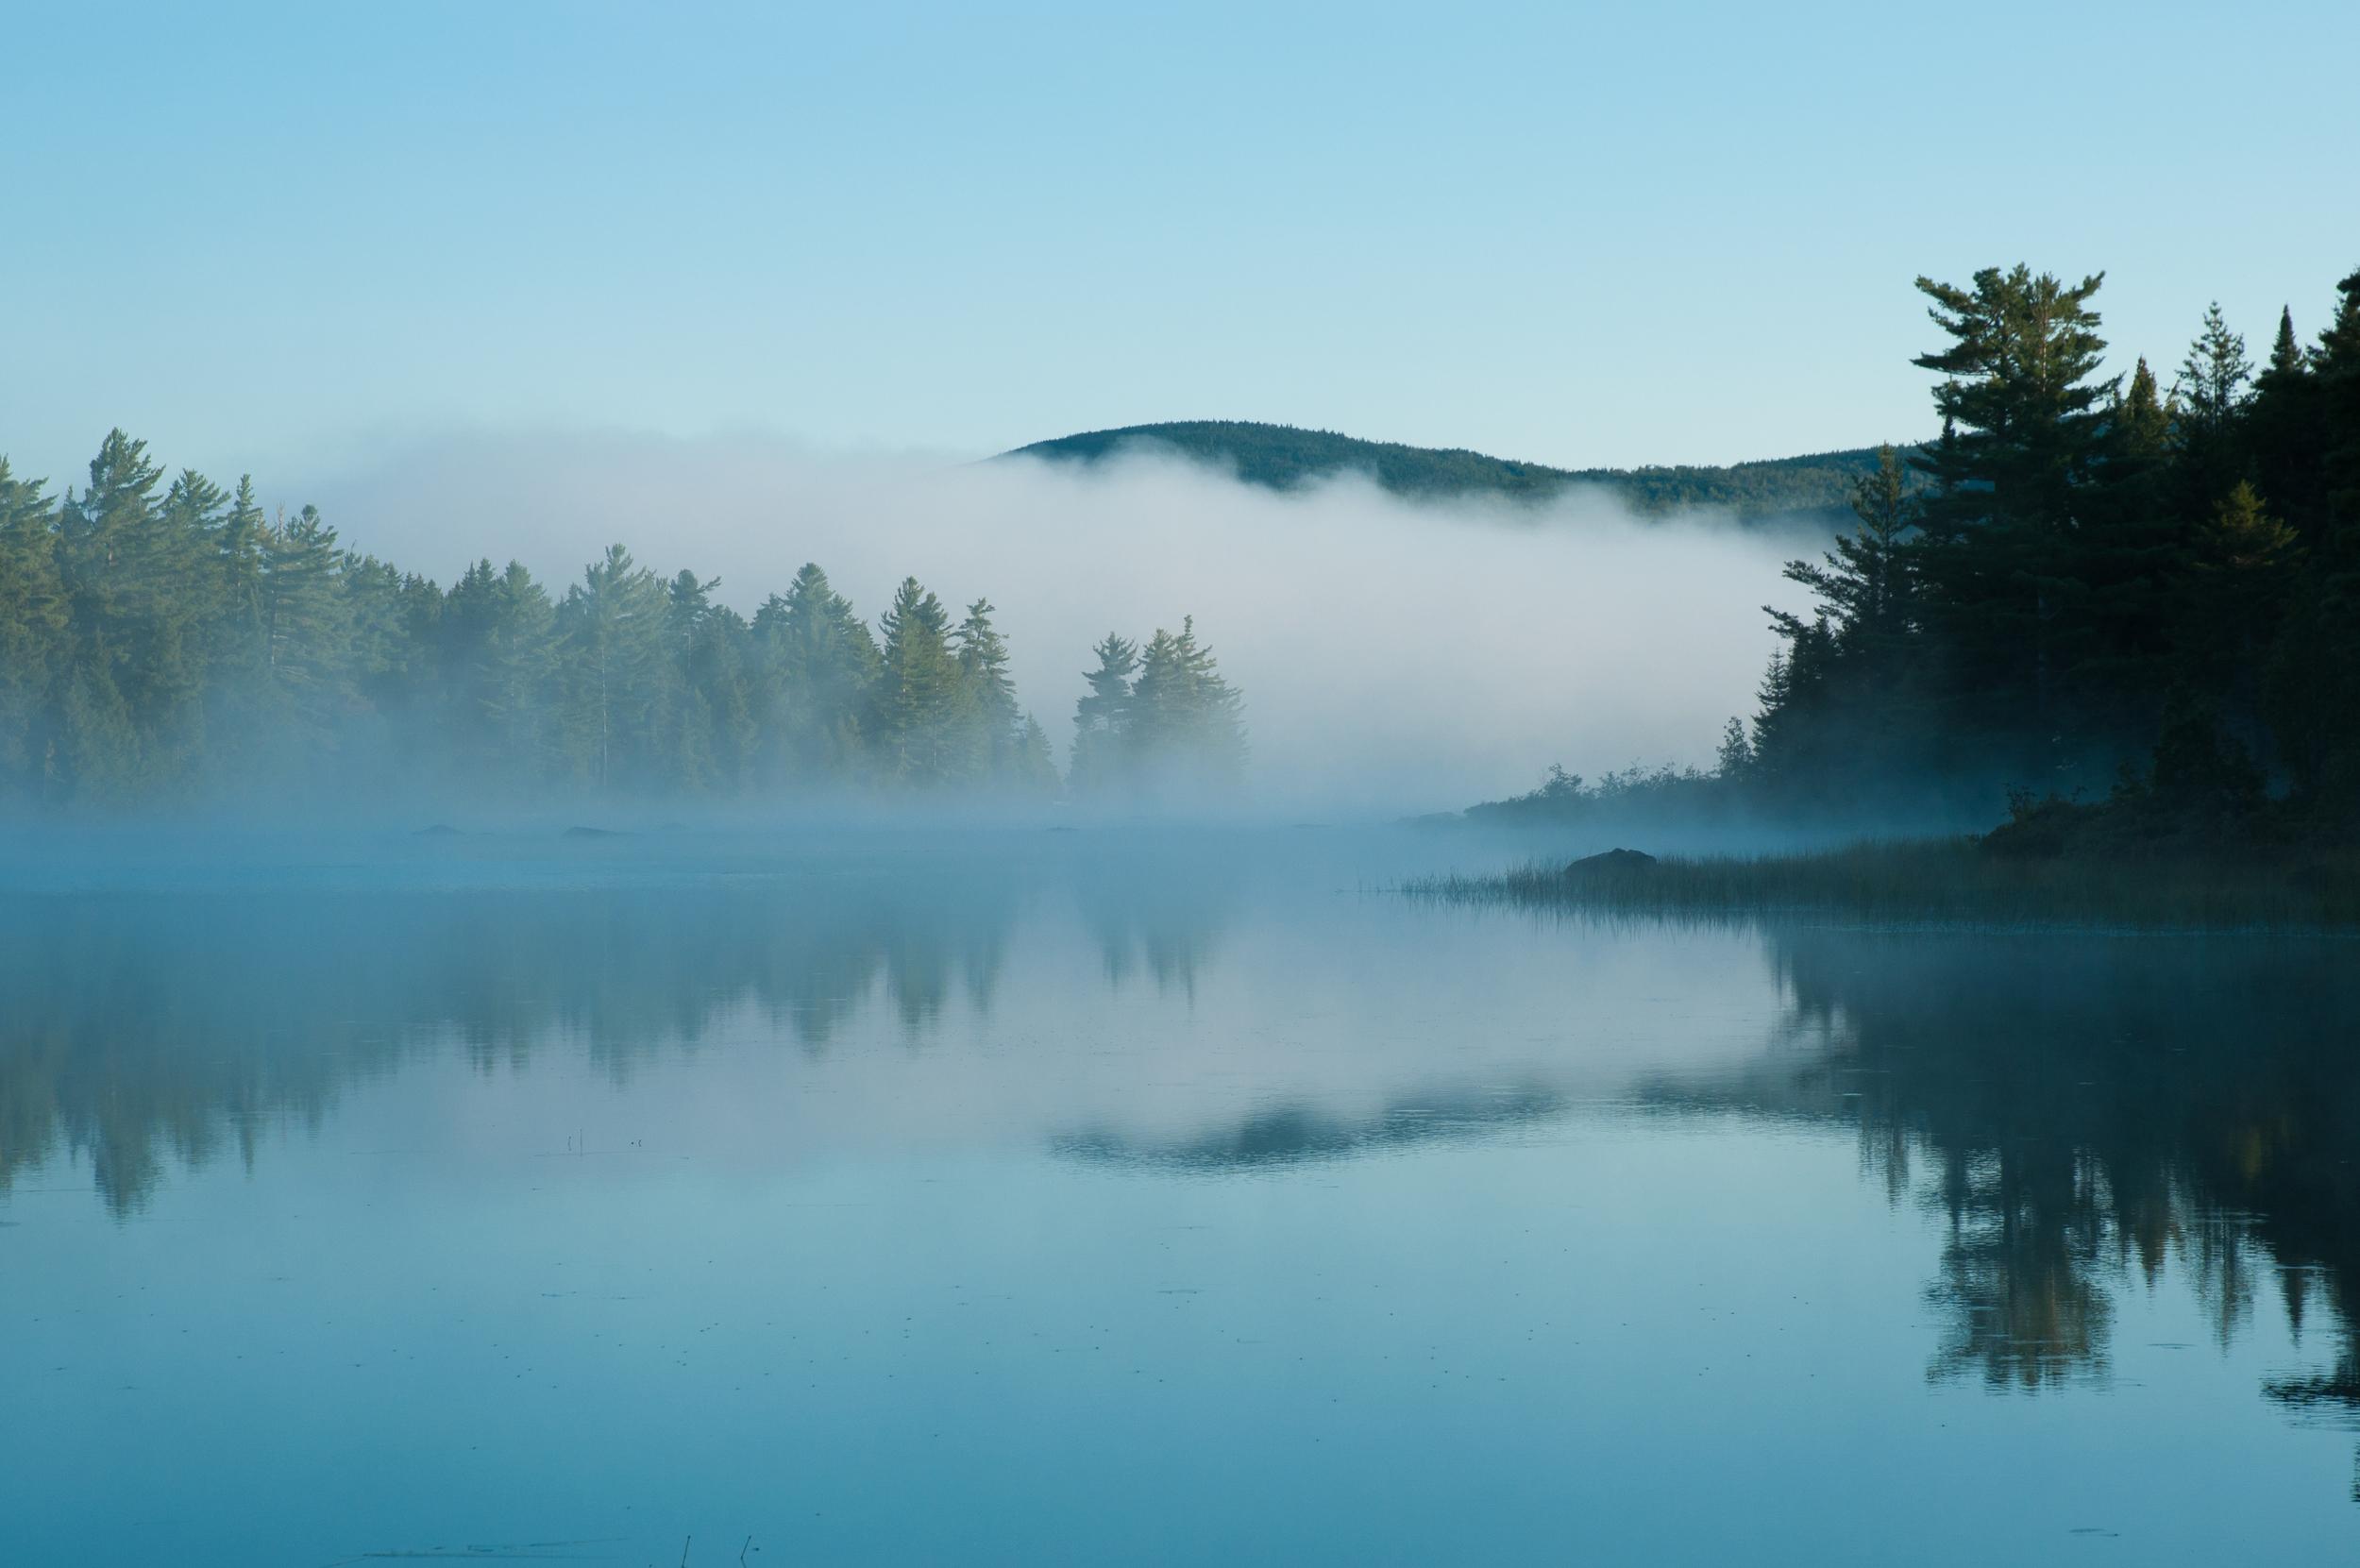 White Cap in the Clouds - Big Lyford Pond, Maine